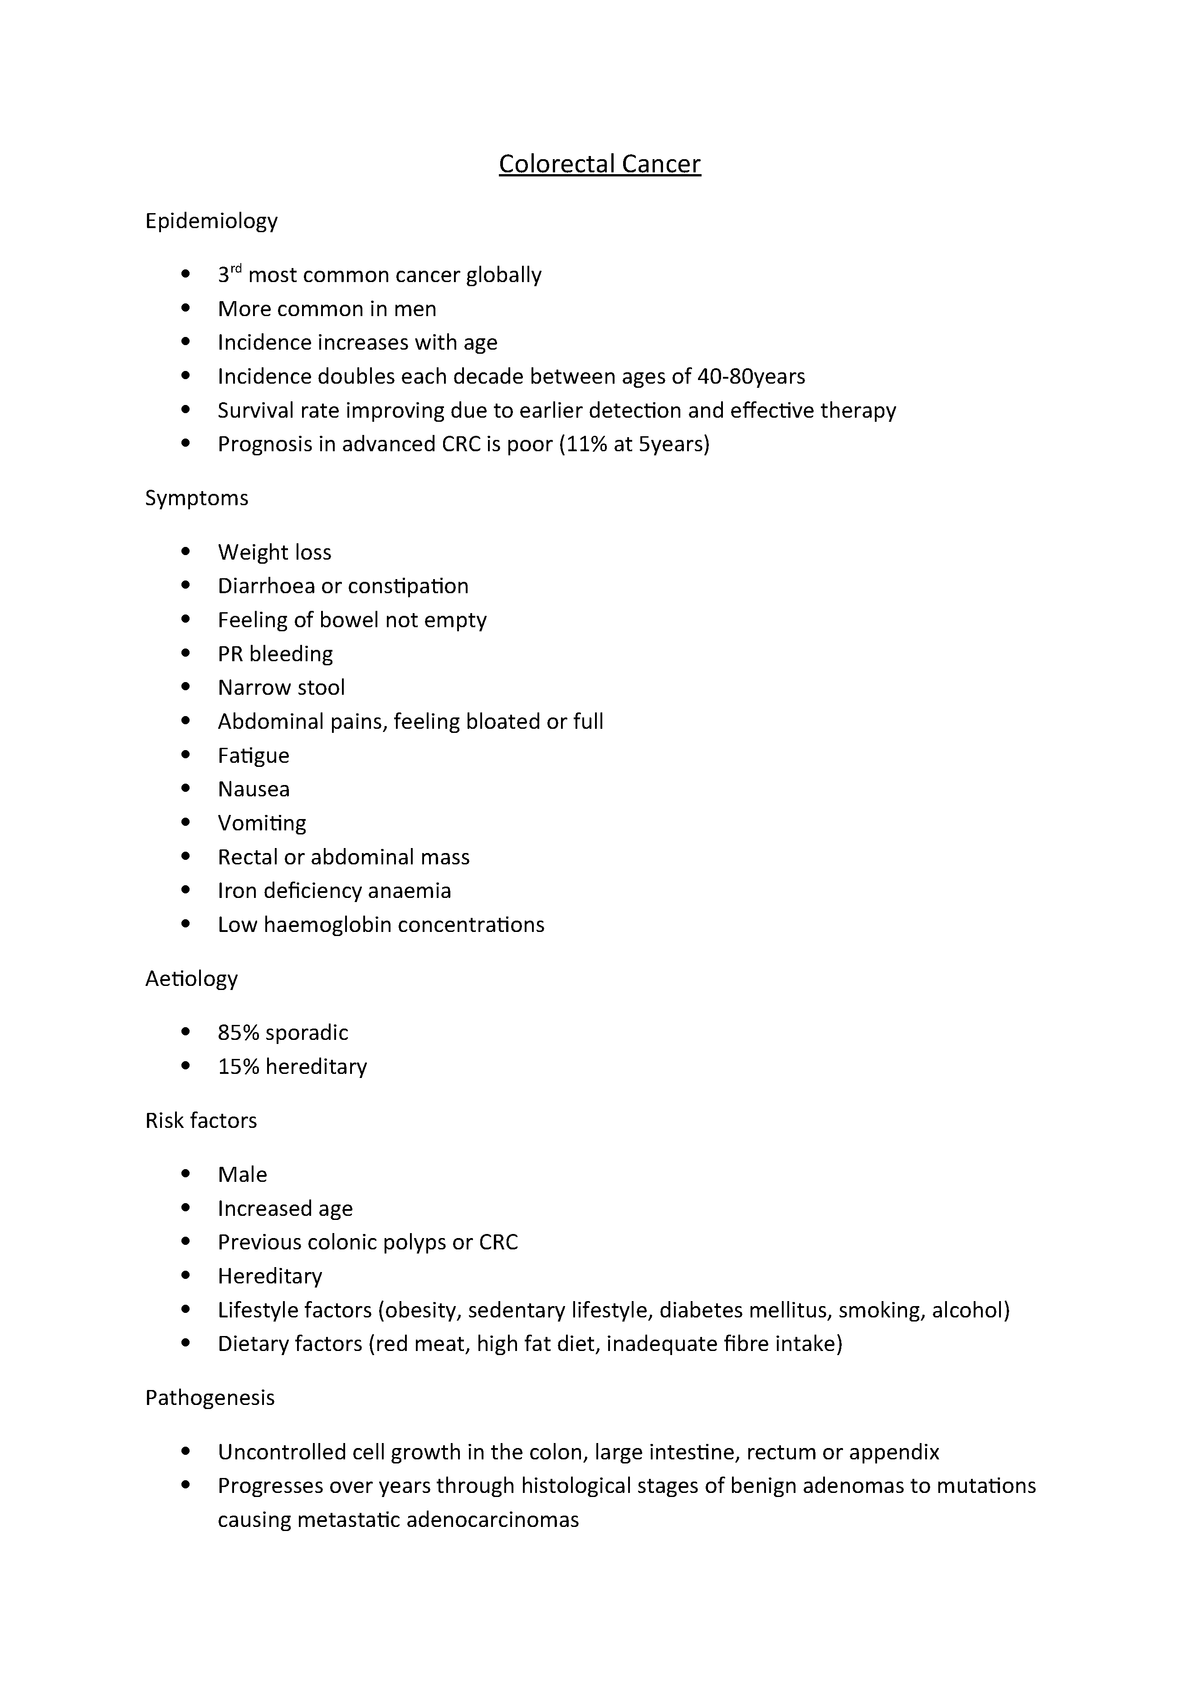 Colorectal Cancer Lecture Notes 12 Mrs211 Csu Studocu